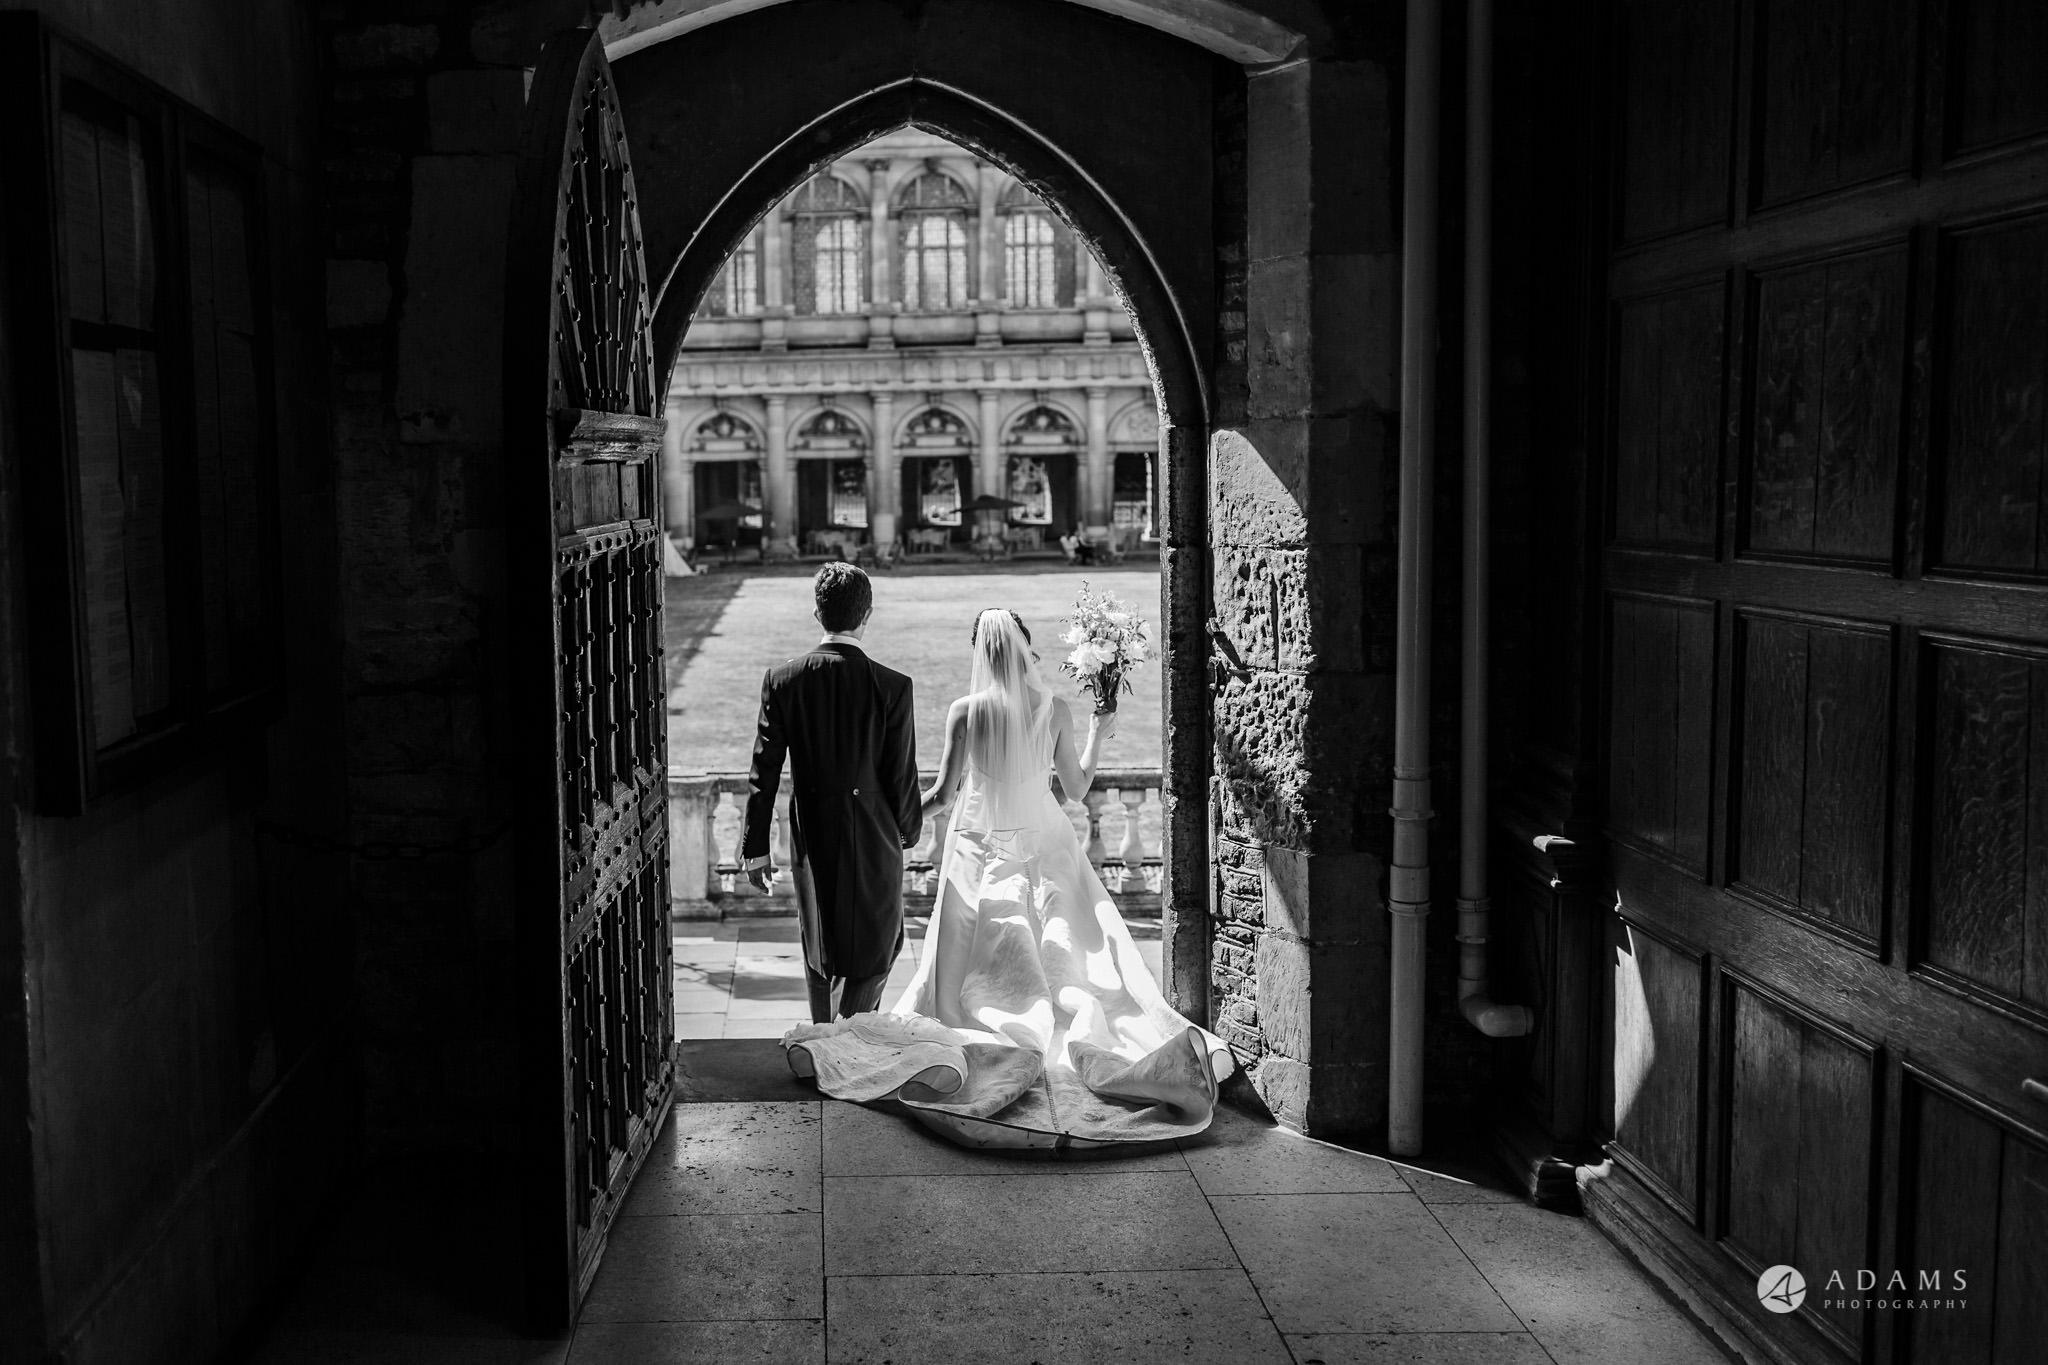 Trinity College Cambridge wedding married couple enter the courtyard